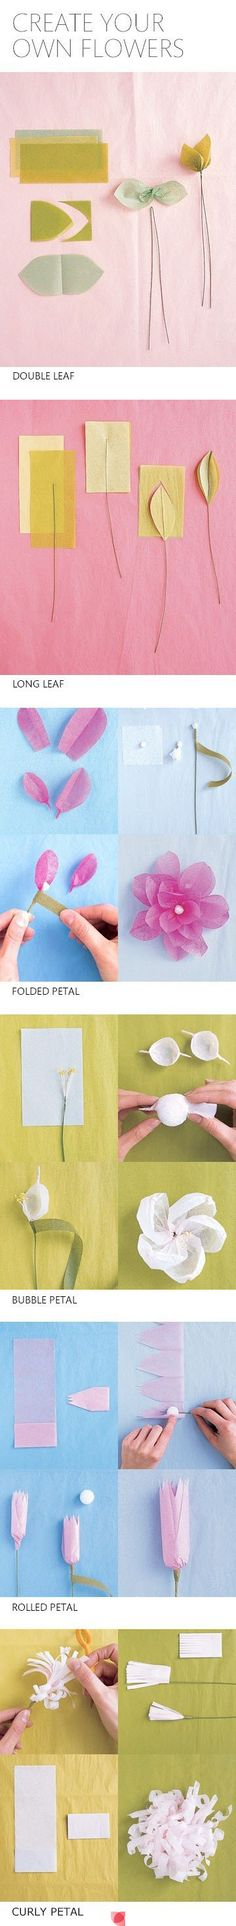 DIY Flowers flowers diy crafts home made easy crafts craft idea crafts ideas diy ideas diy crafts diy idea do it yourself diy projects diy craft handmade